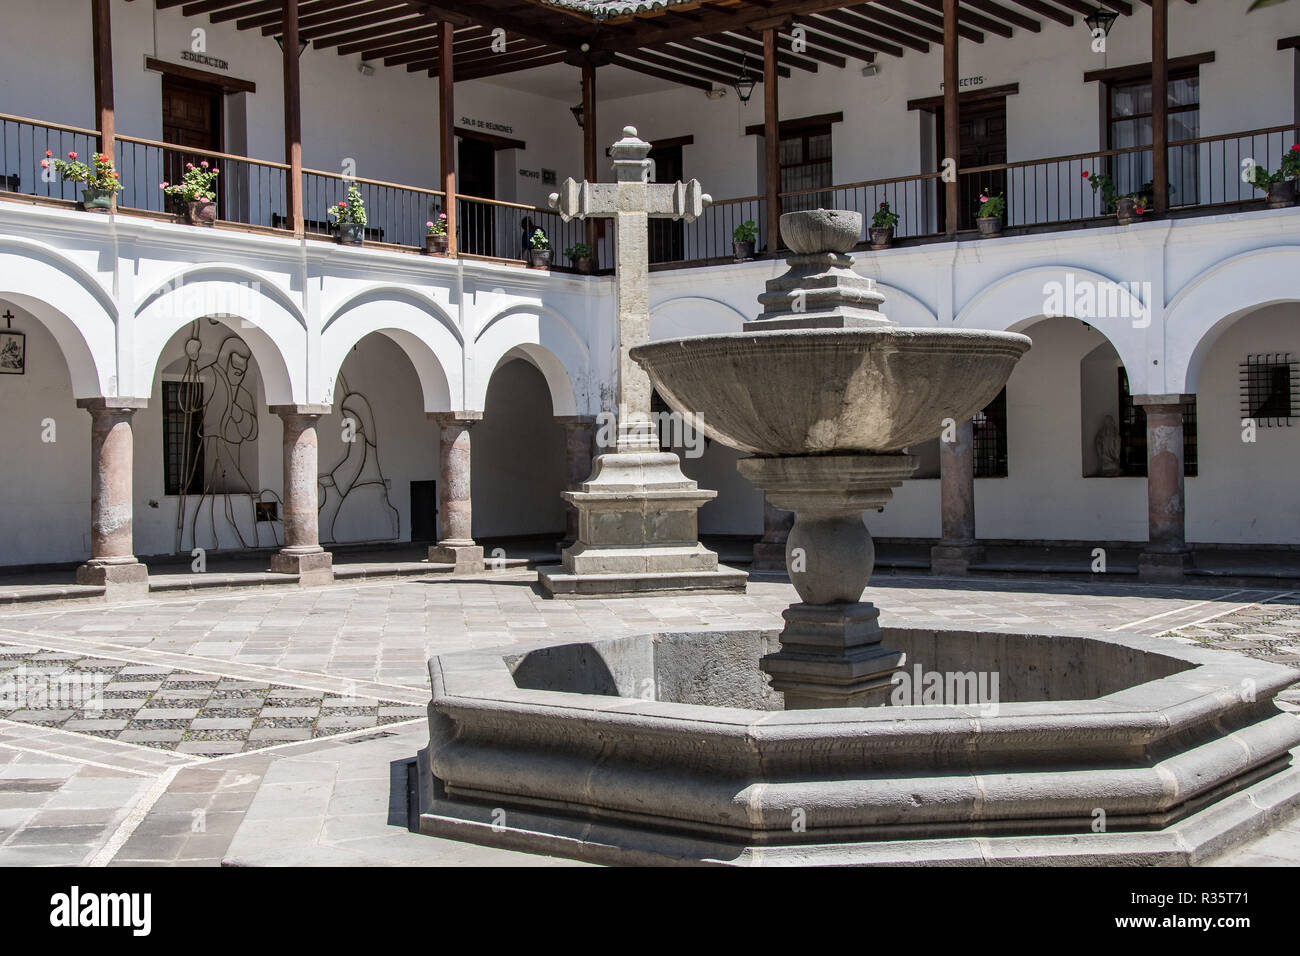 Inner courtyard of the Palacio Arzobispal in the Plaza de la Independencia in Quito Stock Photo